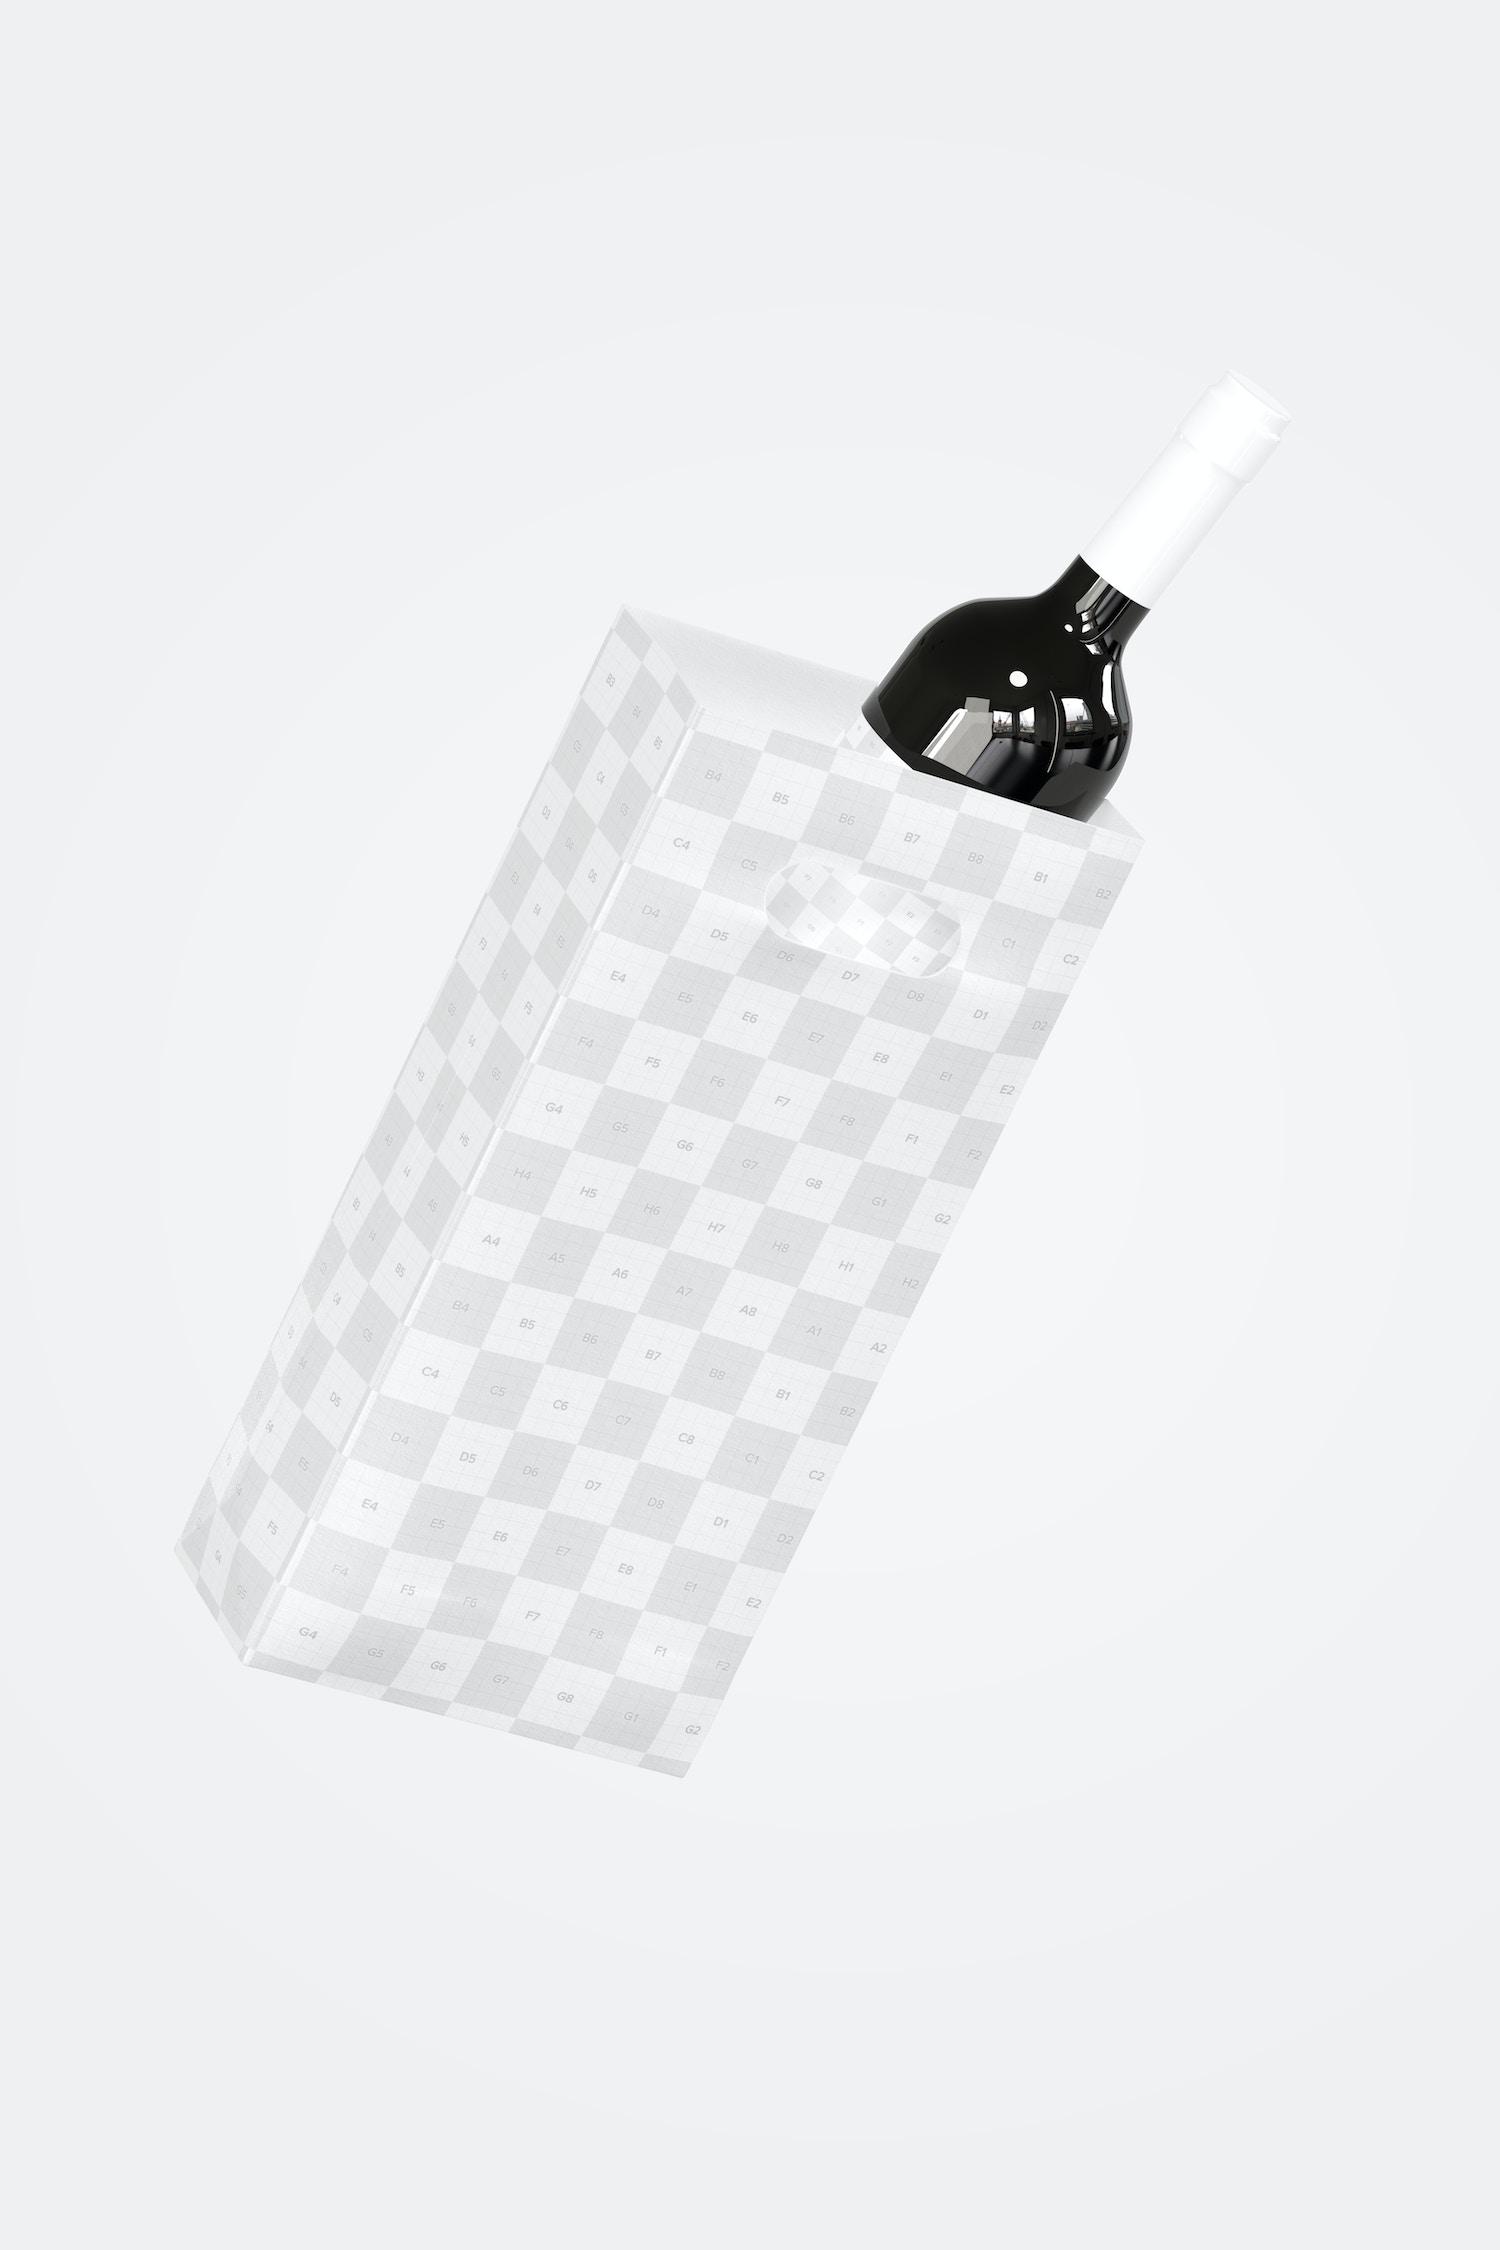 Die-Cut Tall Paper Bag Mockup, Falling